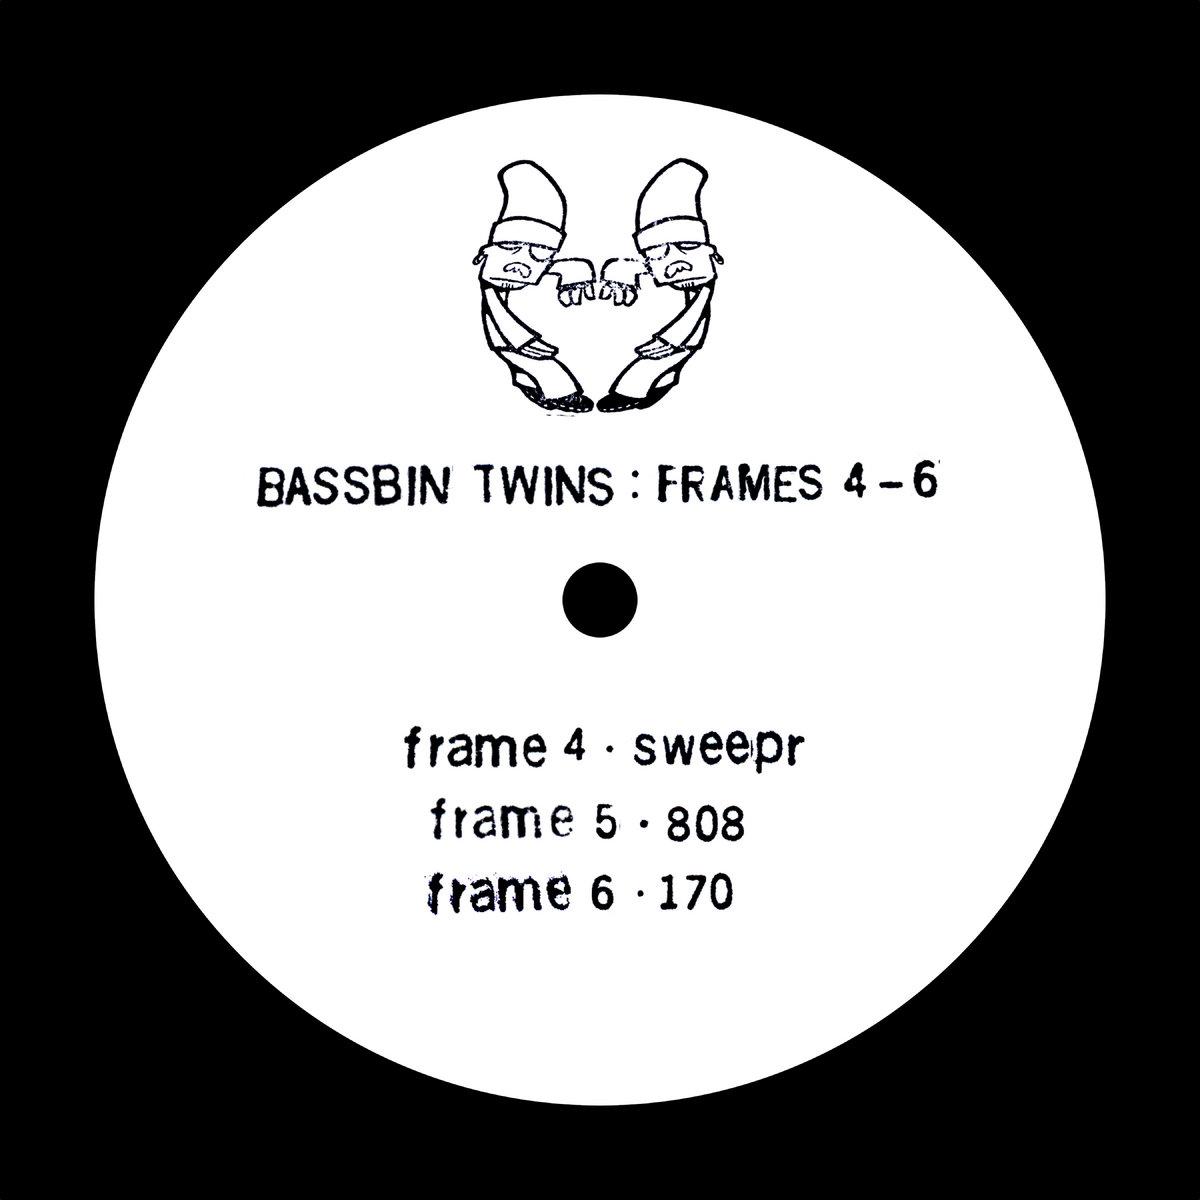 Frames 4 6 Bassbin Twins